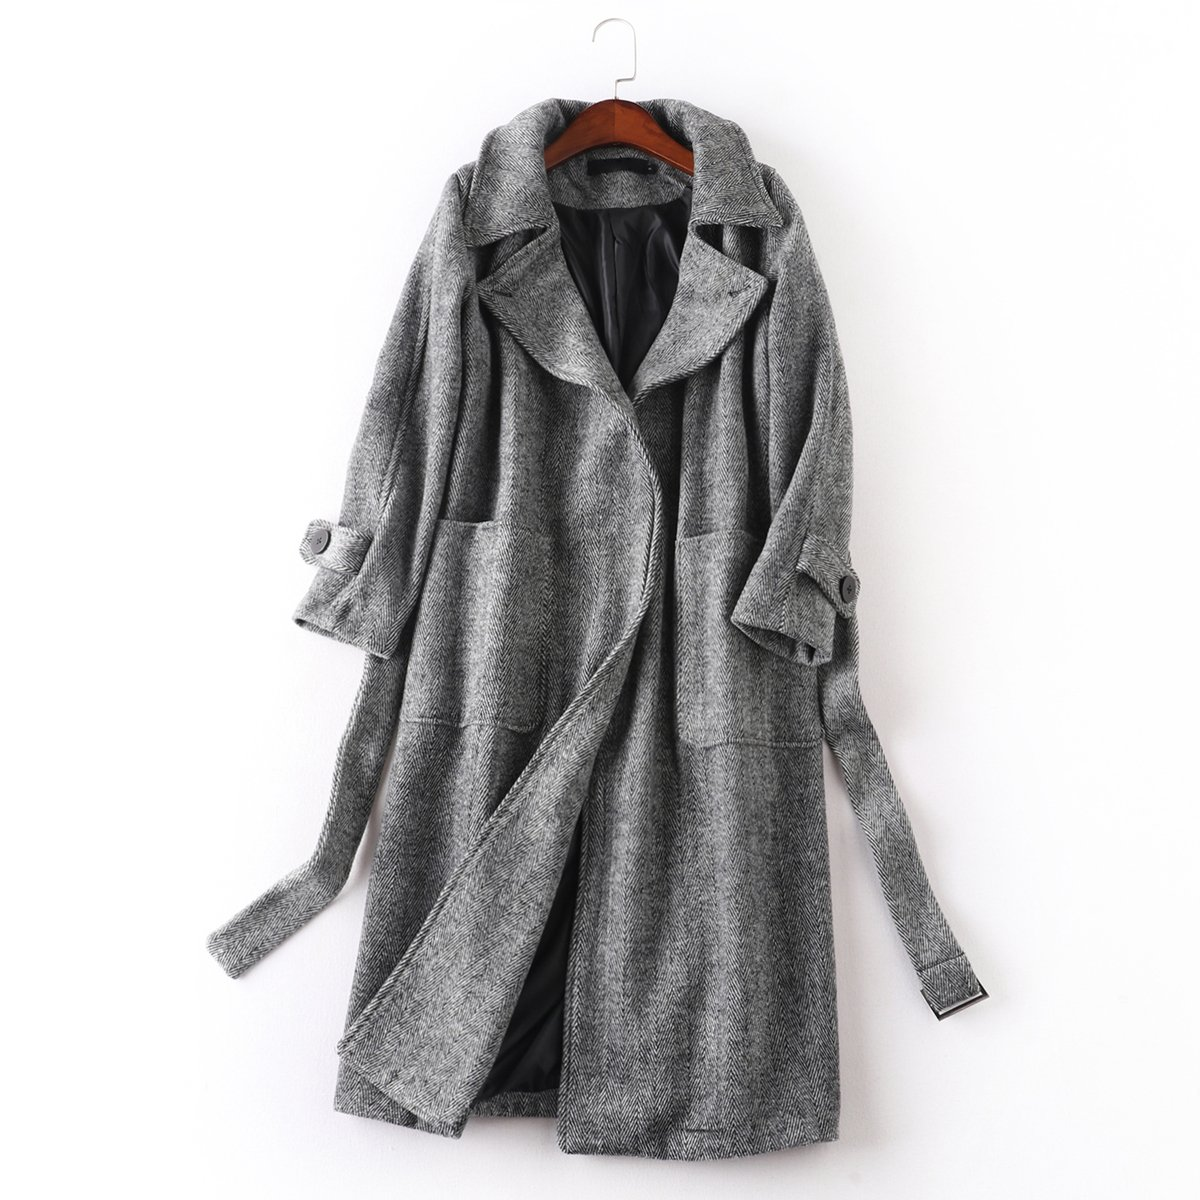 Pugaomsiw einfache und Elegante Wolle Mantel Winter Mode Knie Lange Jacke locker gürtel Wolle Mantel,M,Grau